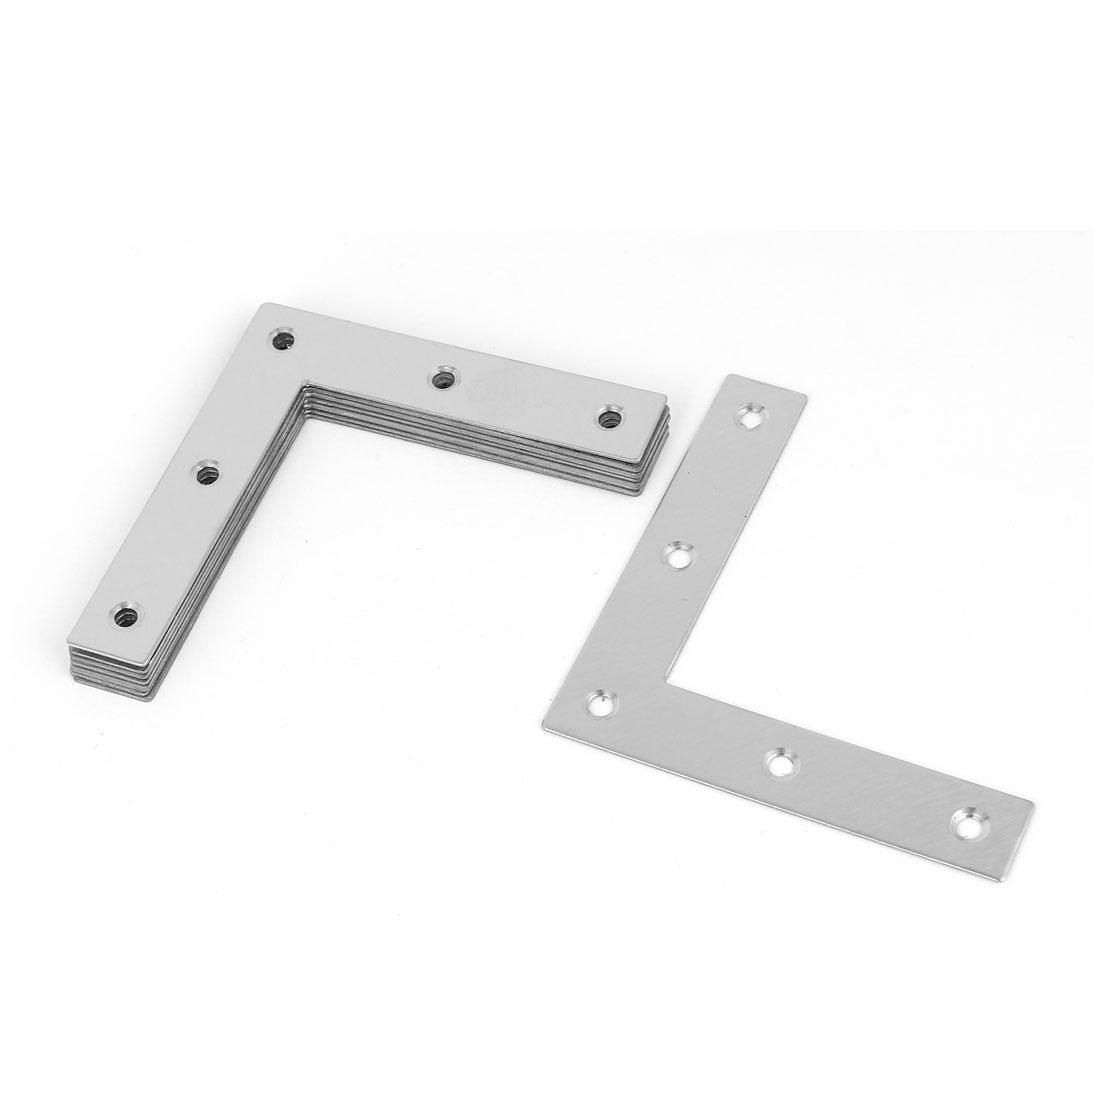 8pcs 80mmx80mm L Shaped Stainless Steel Angle Bracket Corner Brace Silver Tone